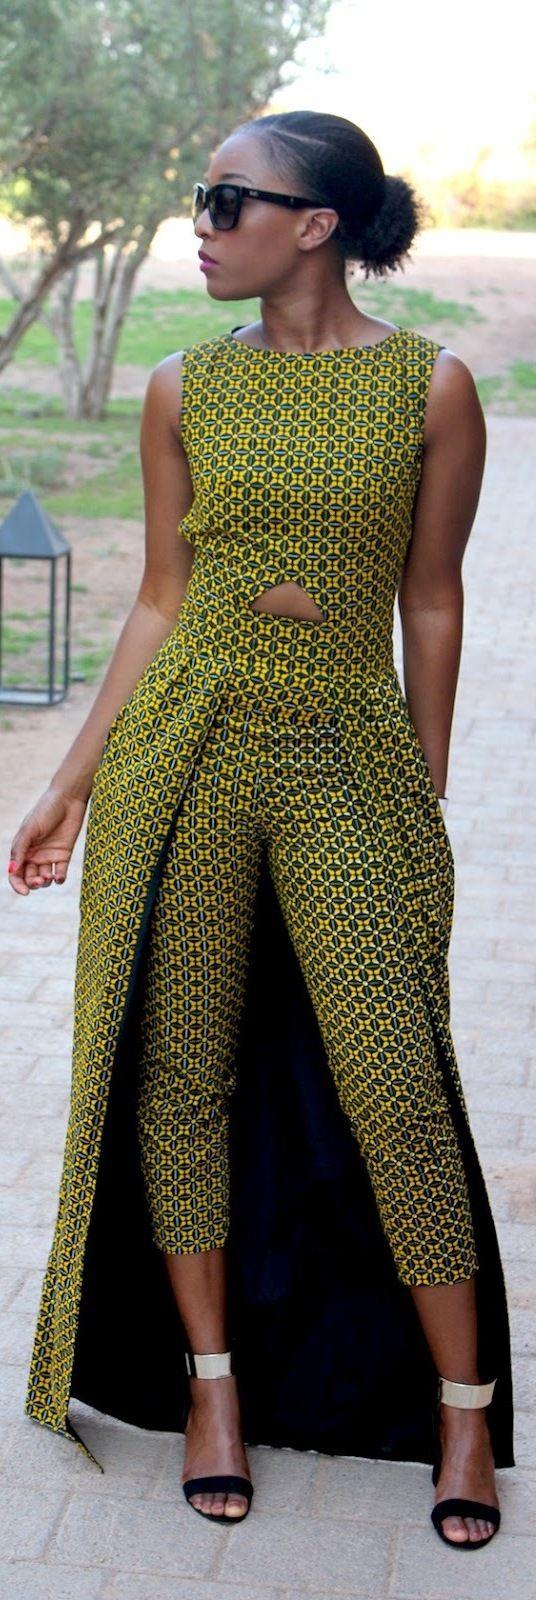 Natacha Baco / Fashion By M'bem Di Fora                                                                                                                                                      More